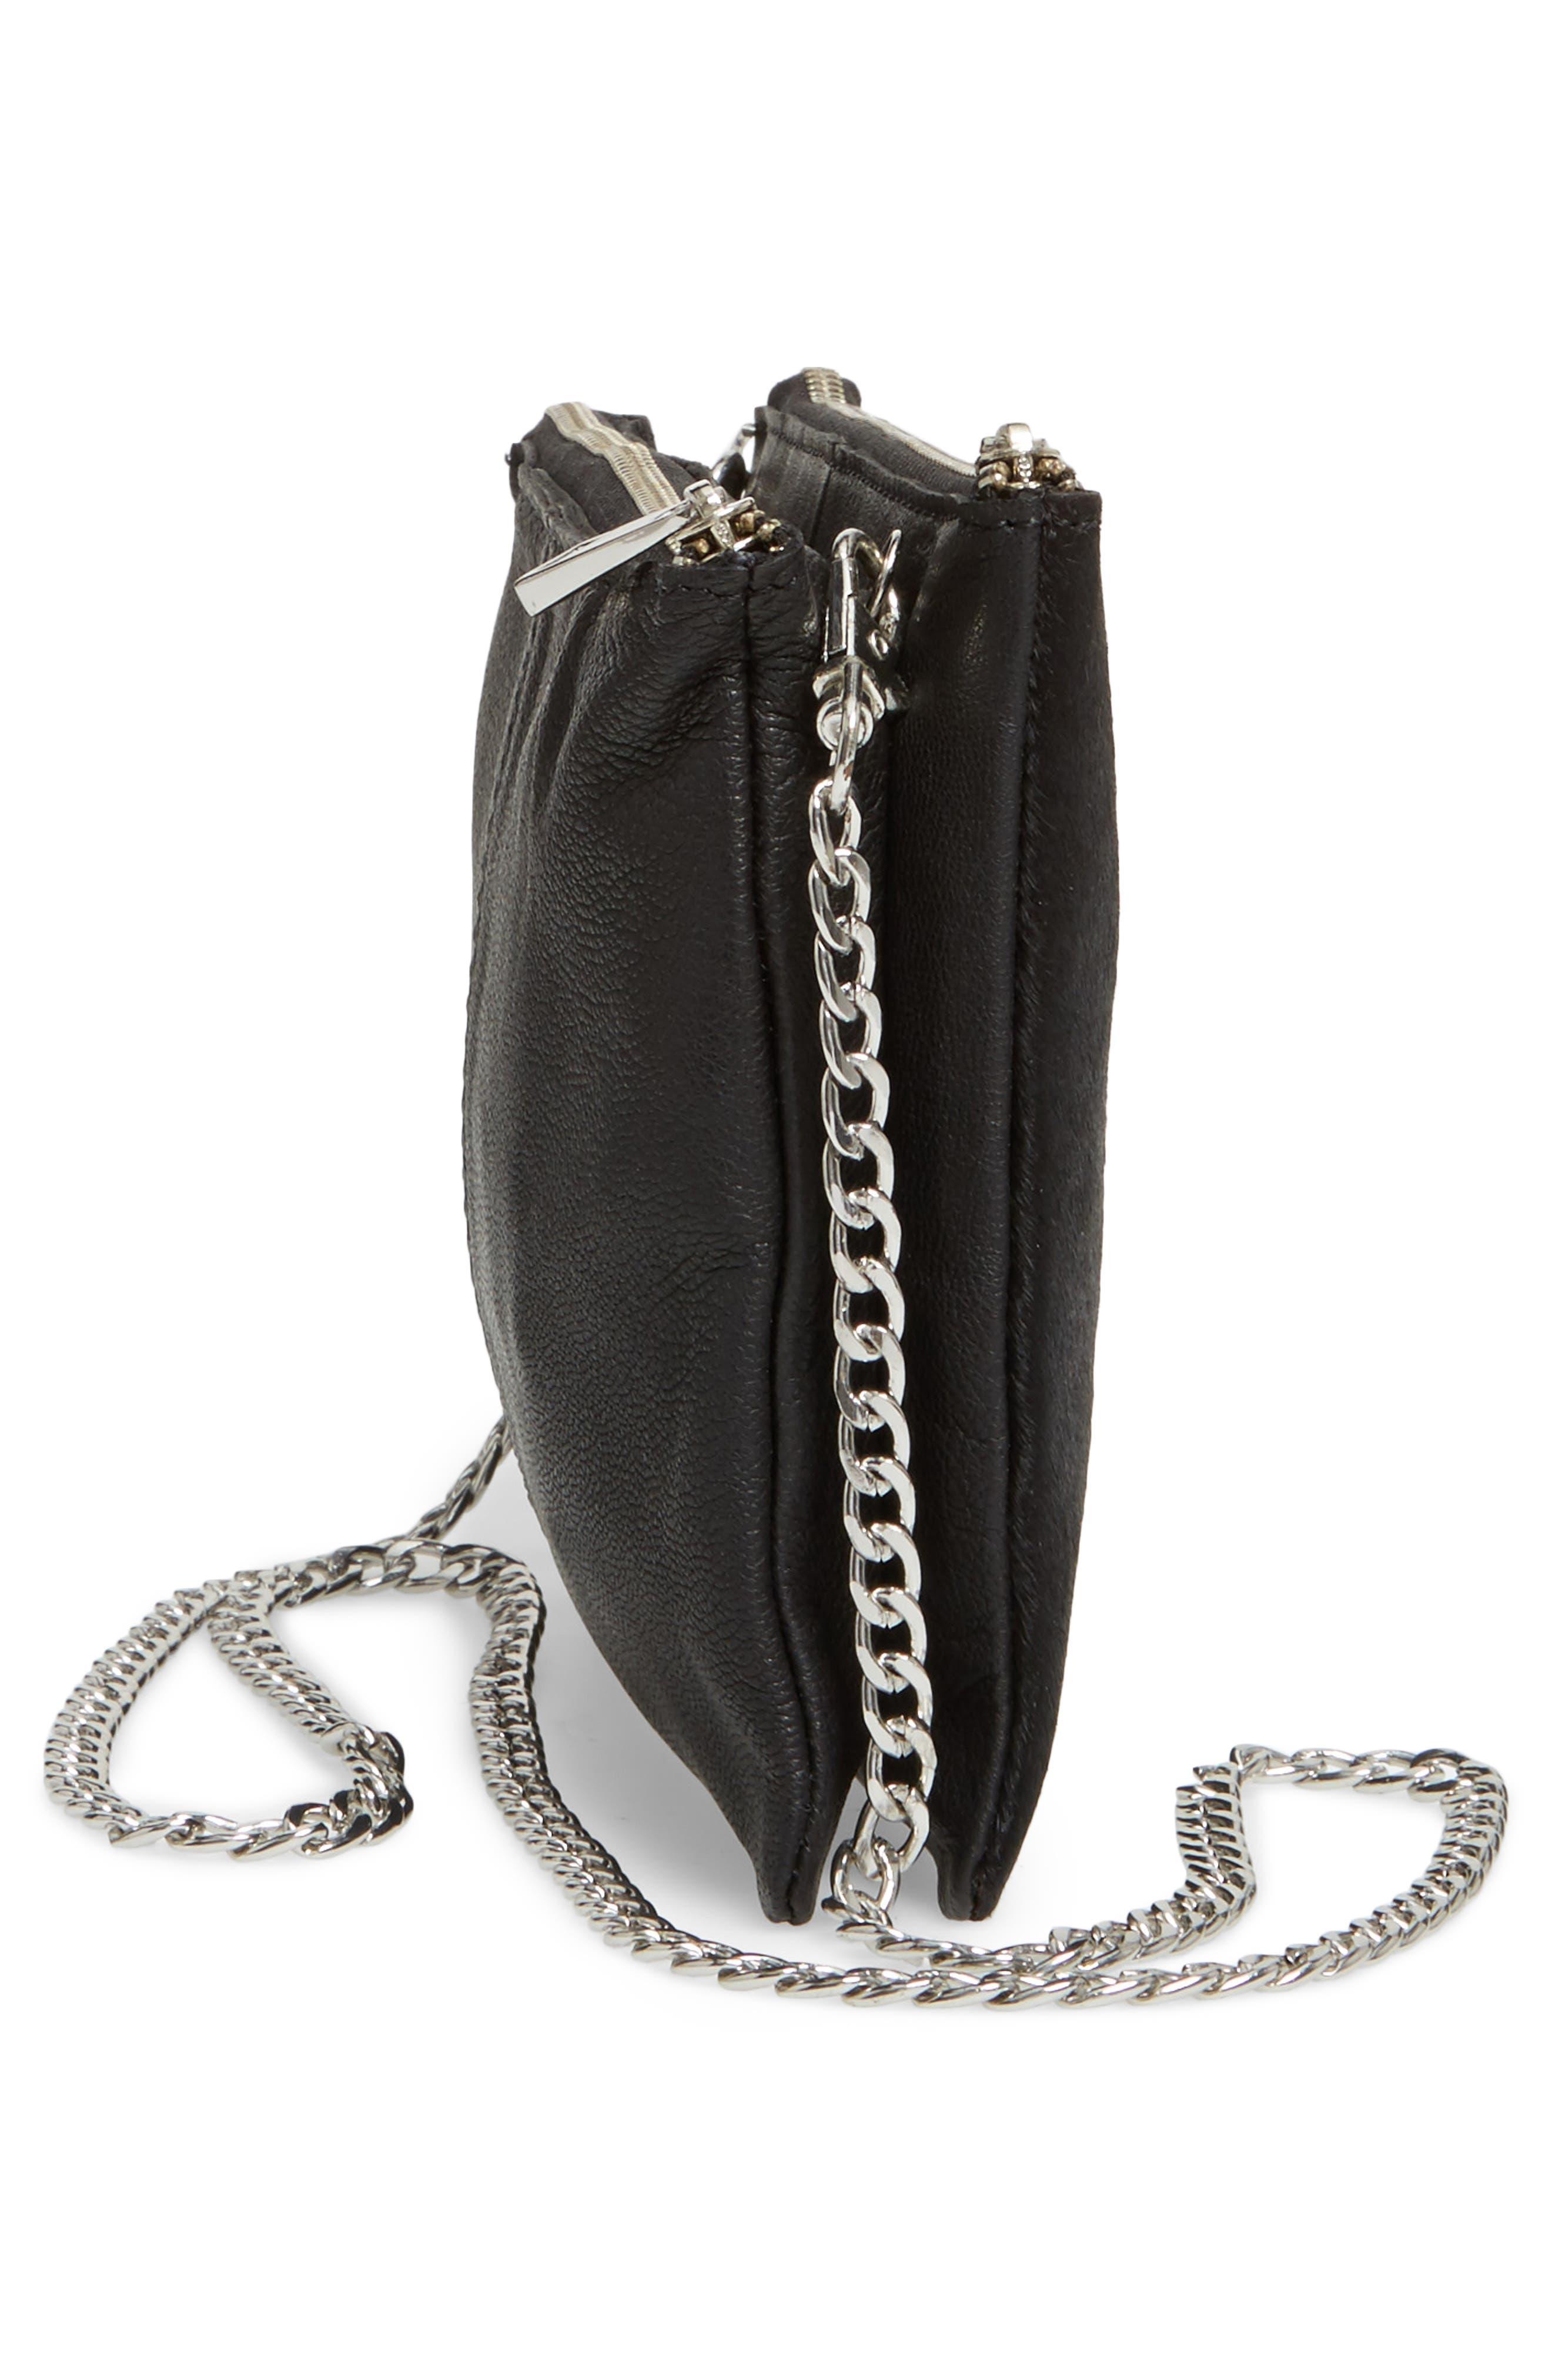 Oakley Leather & Genuine Calf Hair Crossbody Bag,                             Alternate thumbnail 5, color,                             001